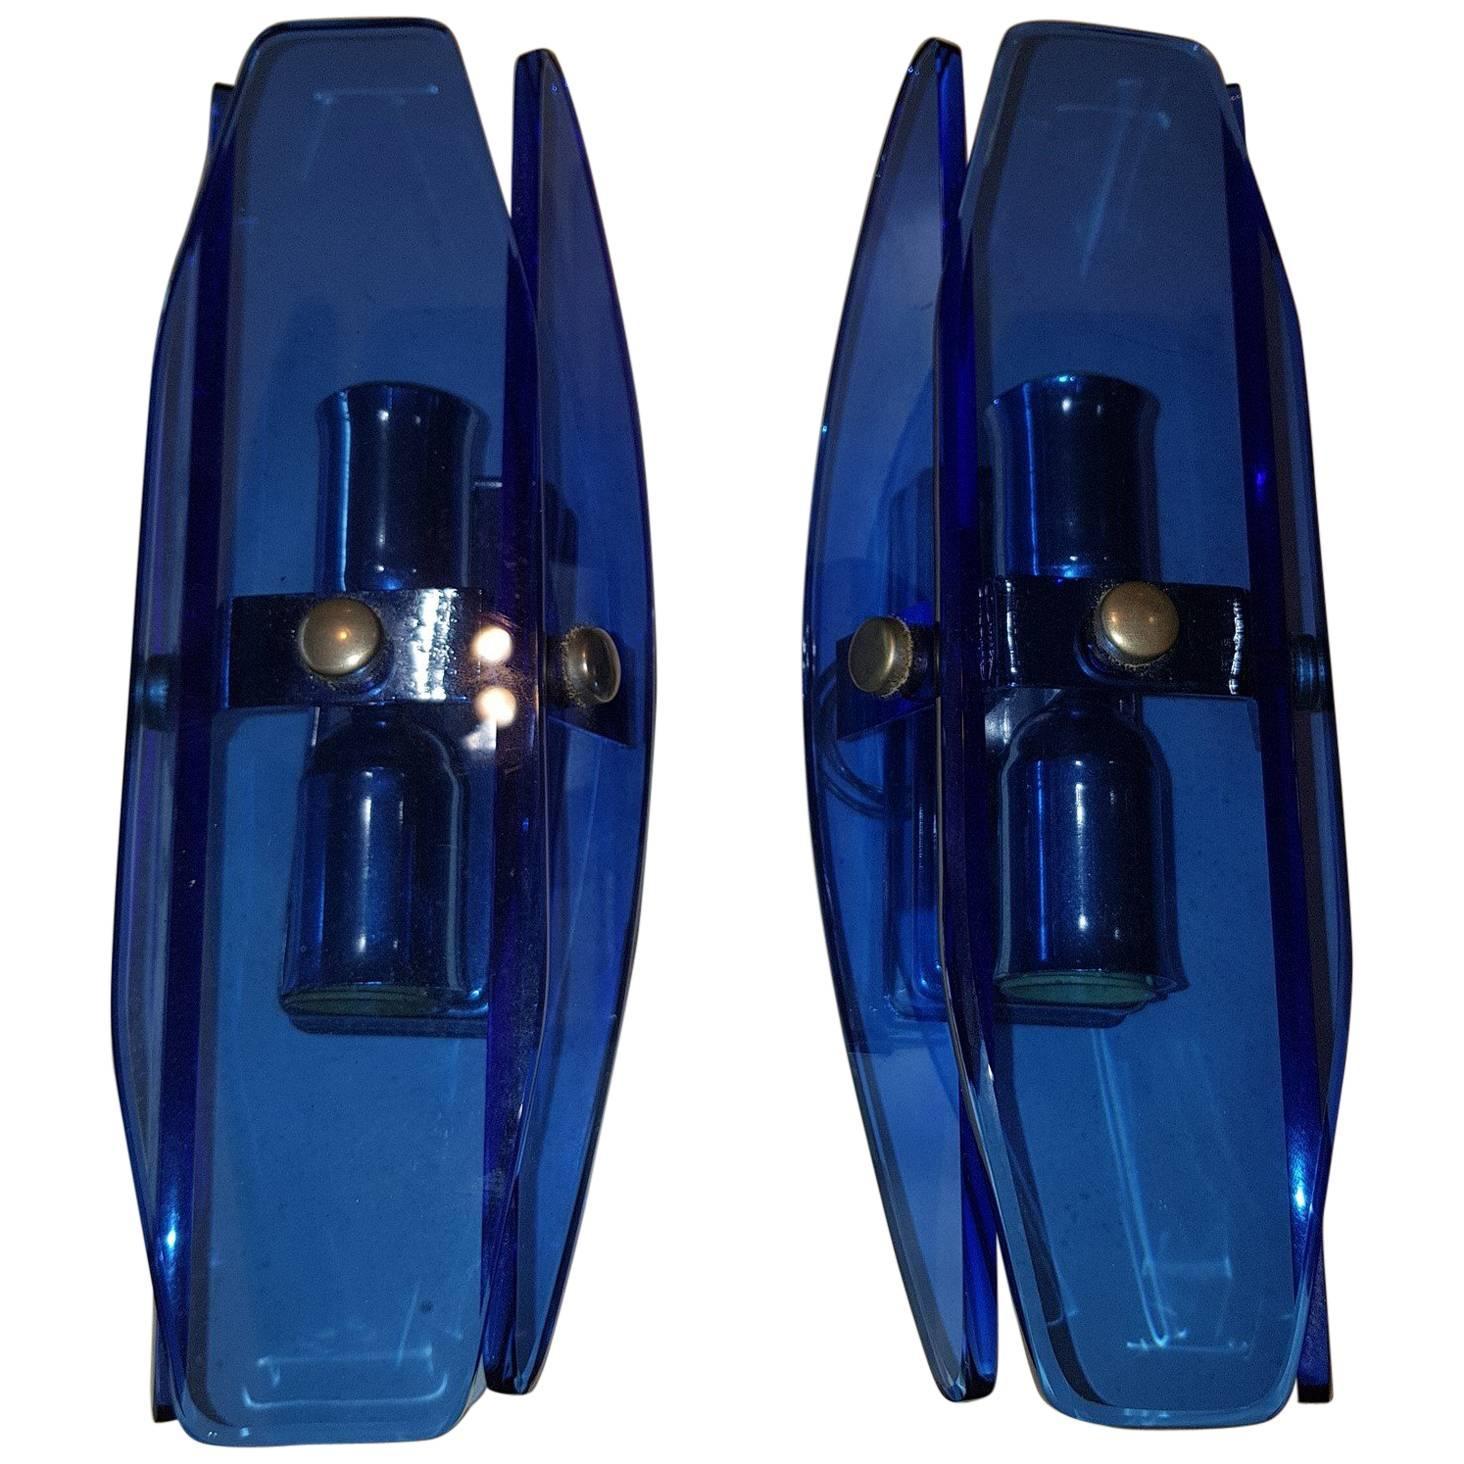 Mid Century Modern, Italian Pair of Blue Glass Wall Lights by Veca